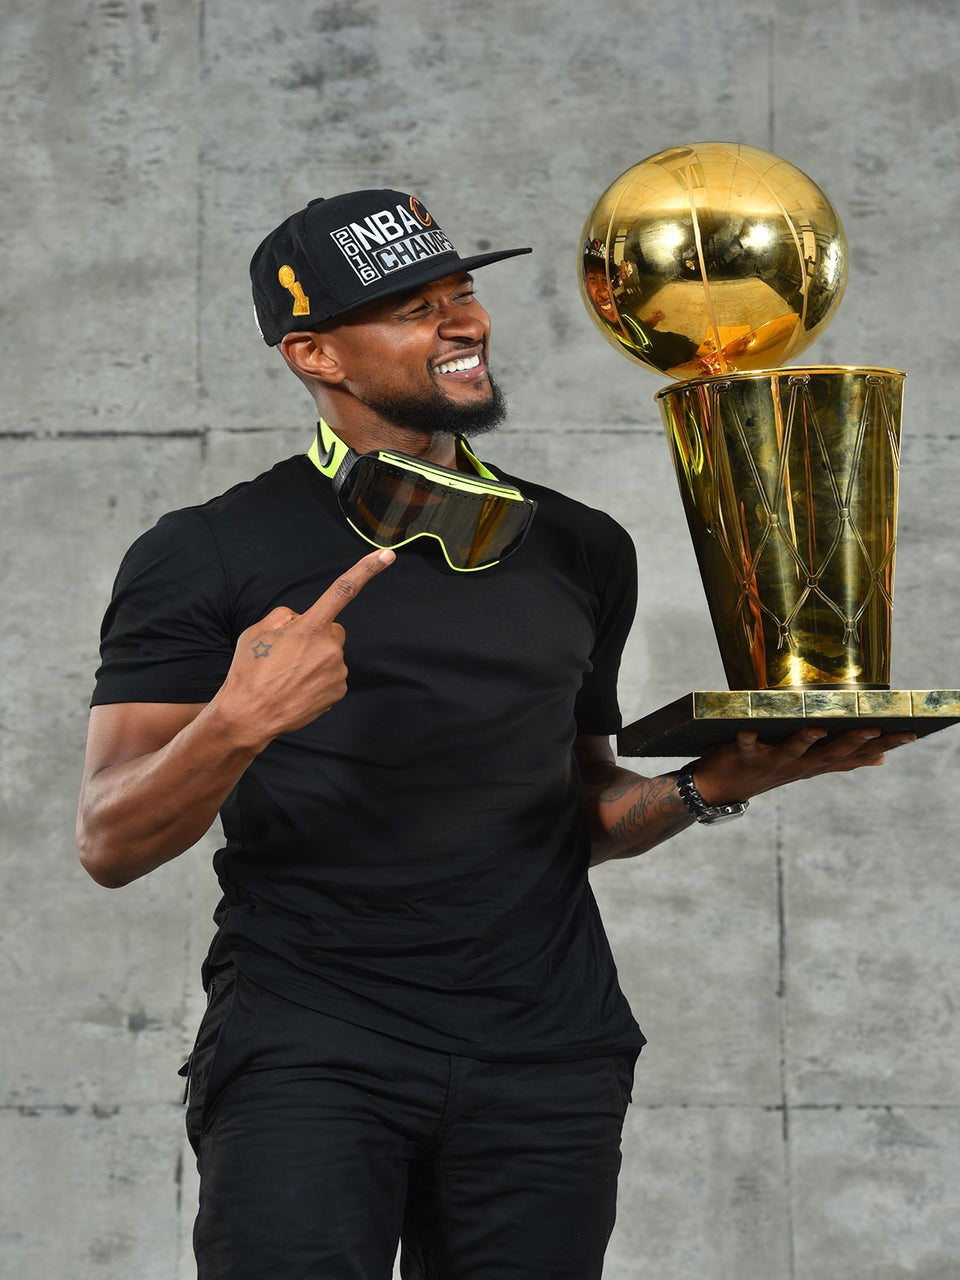 Usher Has a Good Reason to Celebrate the Cavs NBA Championship Win